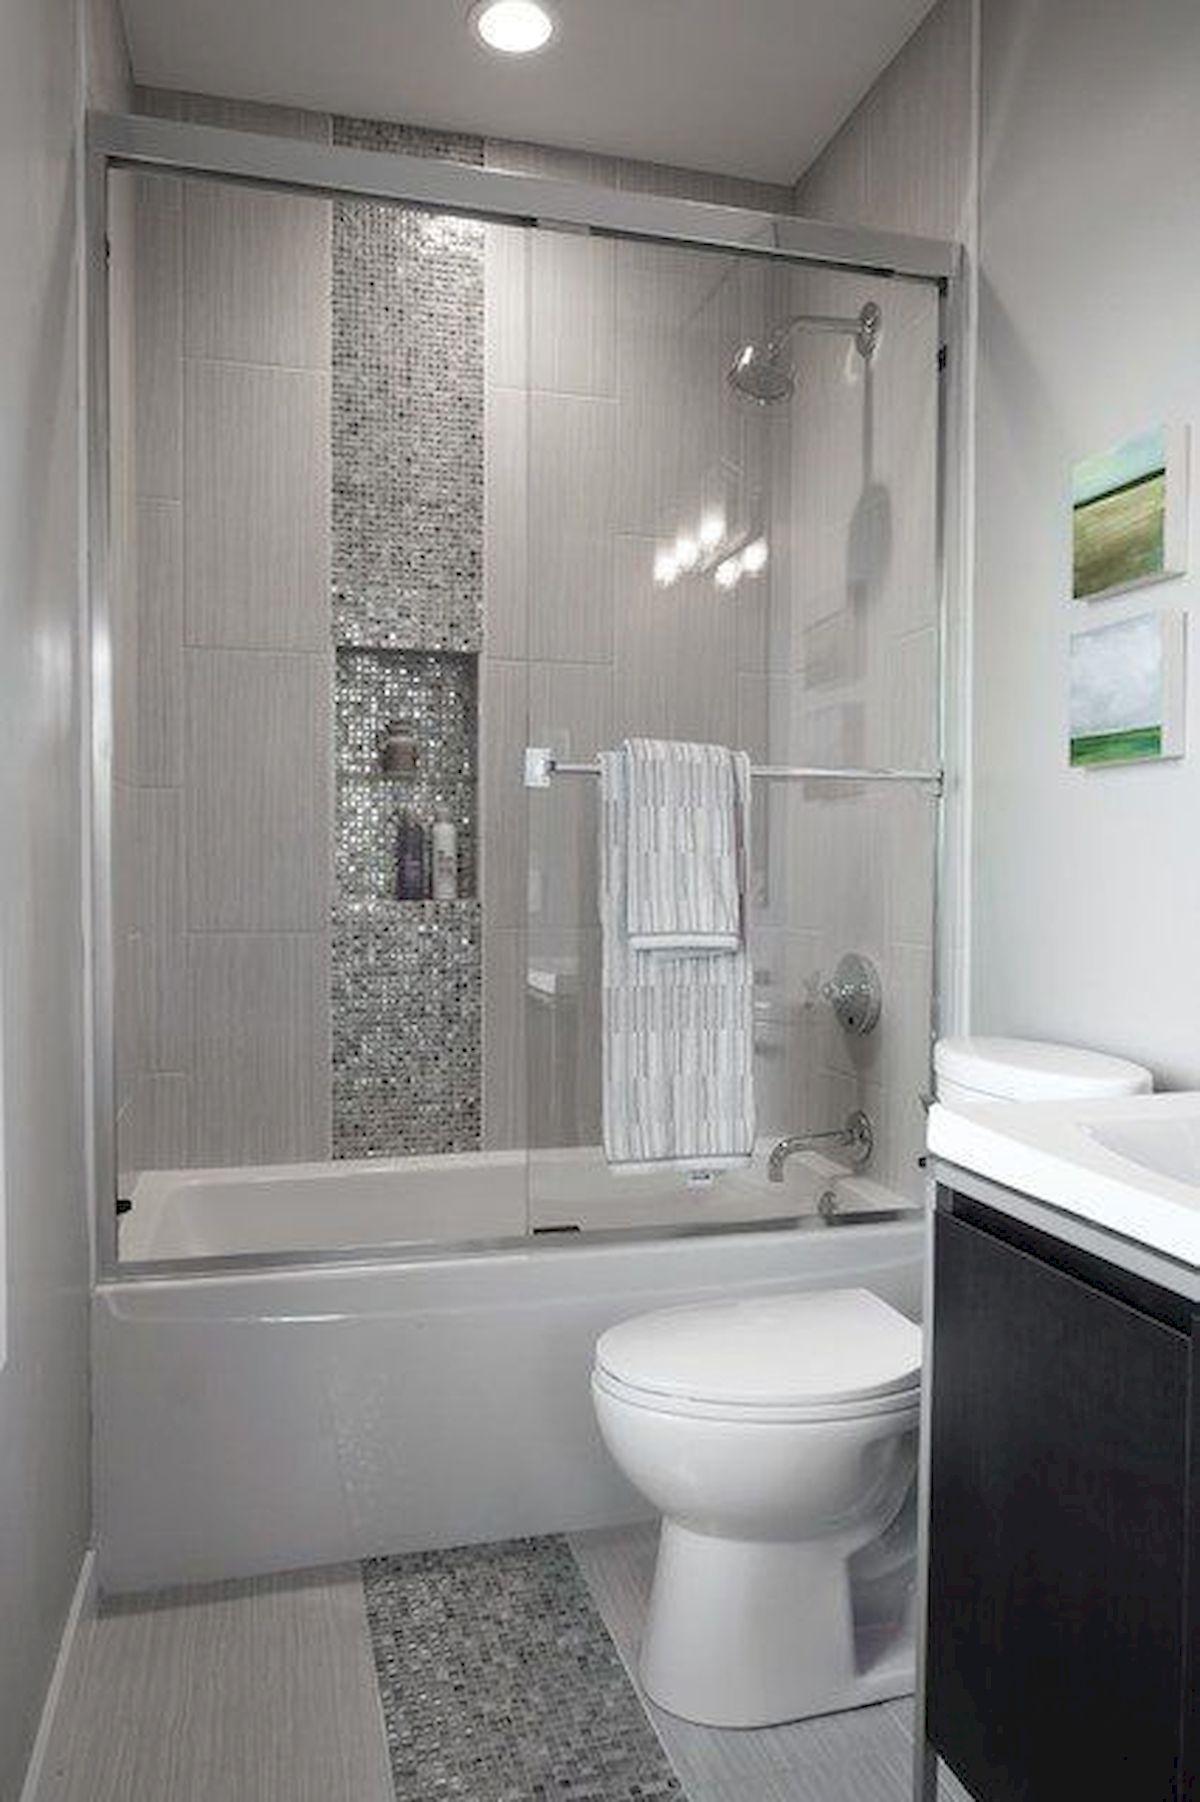 60 elegant small master bathroom remodel ideas 20 on bathroom renovation ideas for small bathrooms id=36022